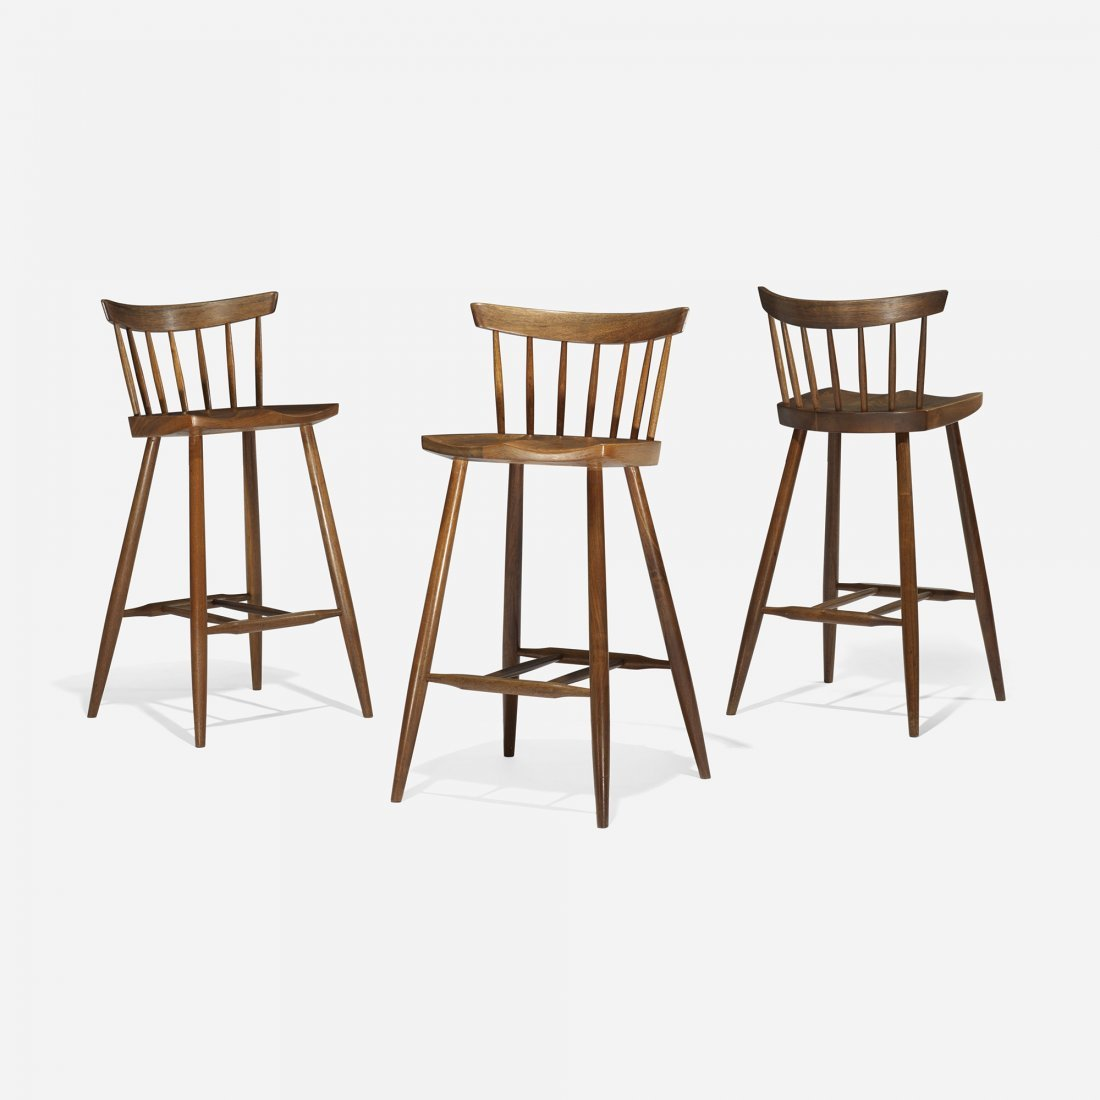 George Nakashima High chairs, set of three